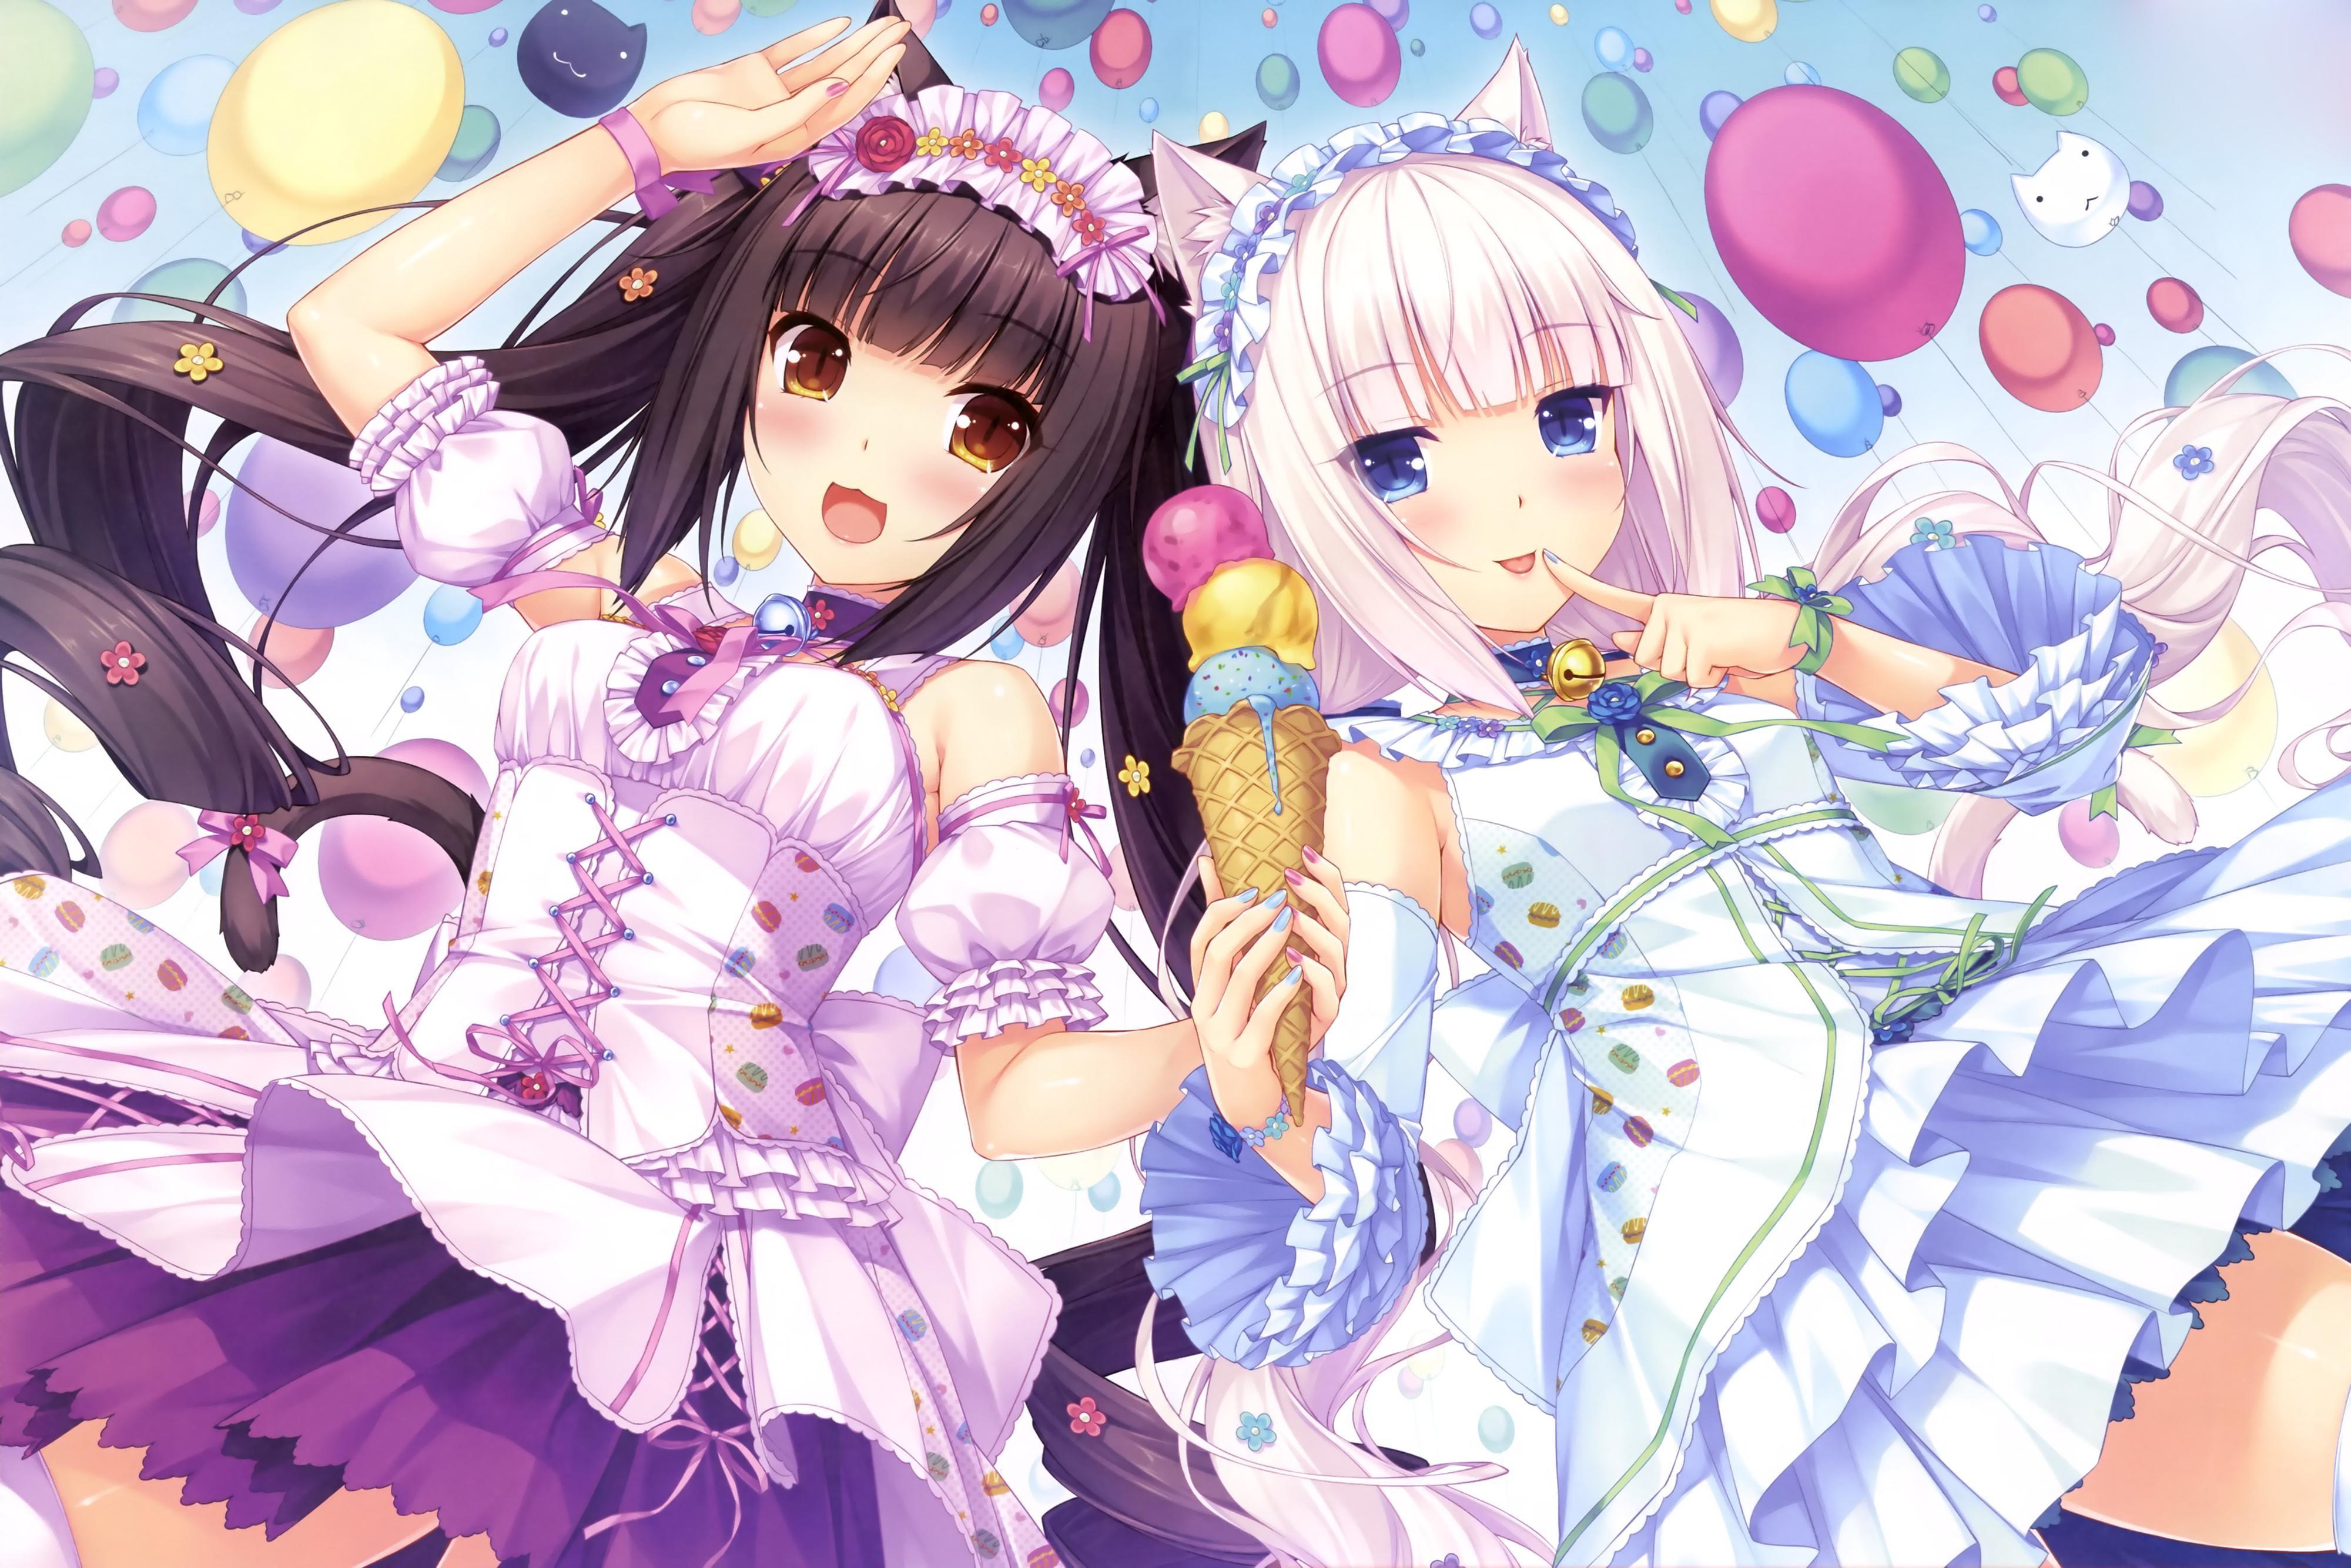 Anime 4000x2668 anime girls anime cat girl ice cream Neko Para Chocolat (Neko Para) Vanilla (Neko Para) visual novel balloon